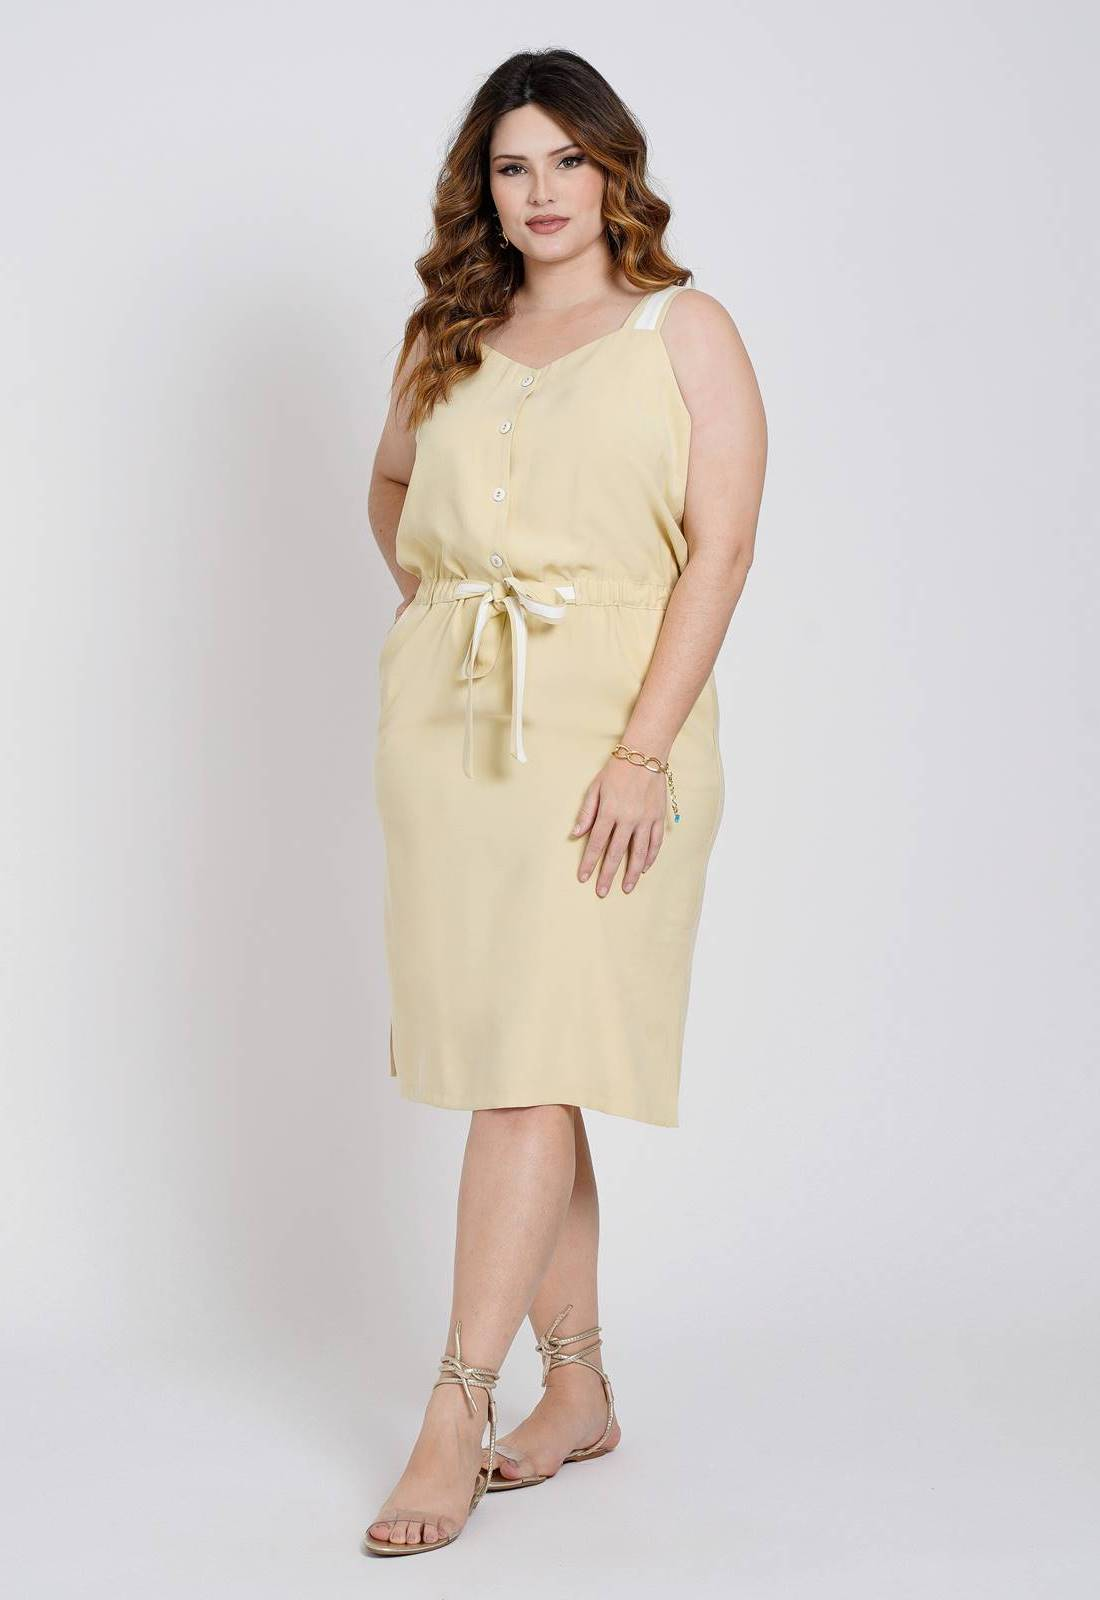 Vestido bicolor plus size midi amarelo Ref. U79821